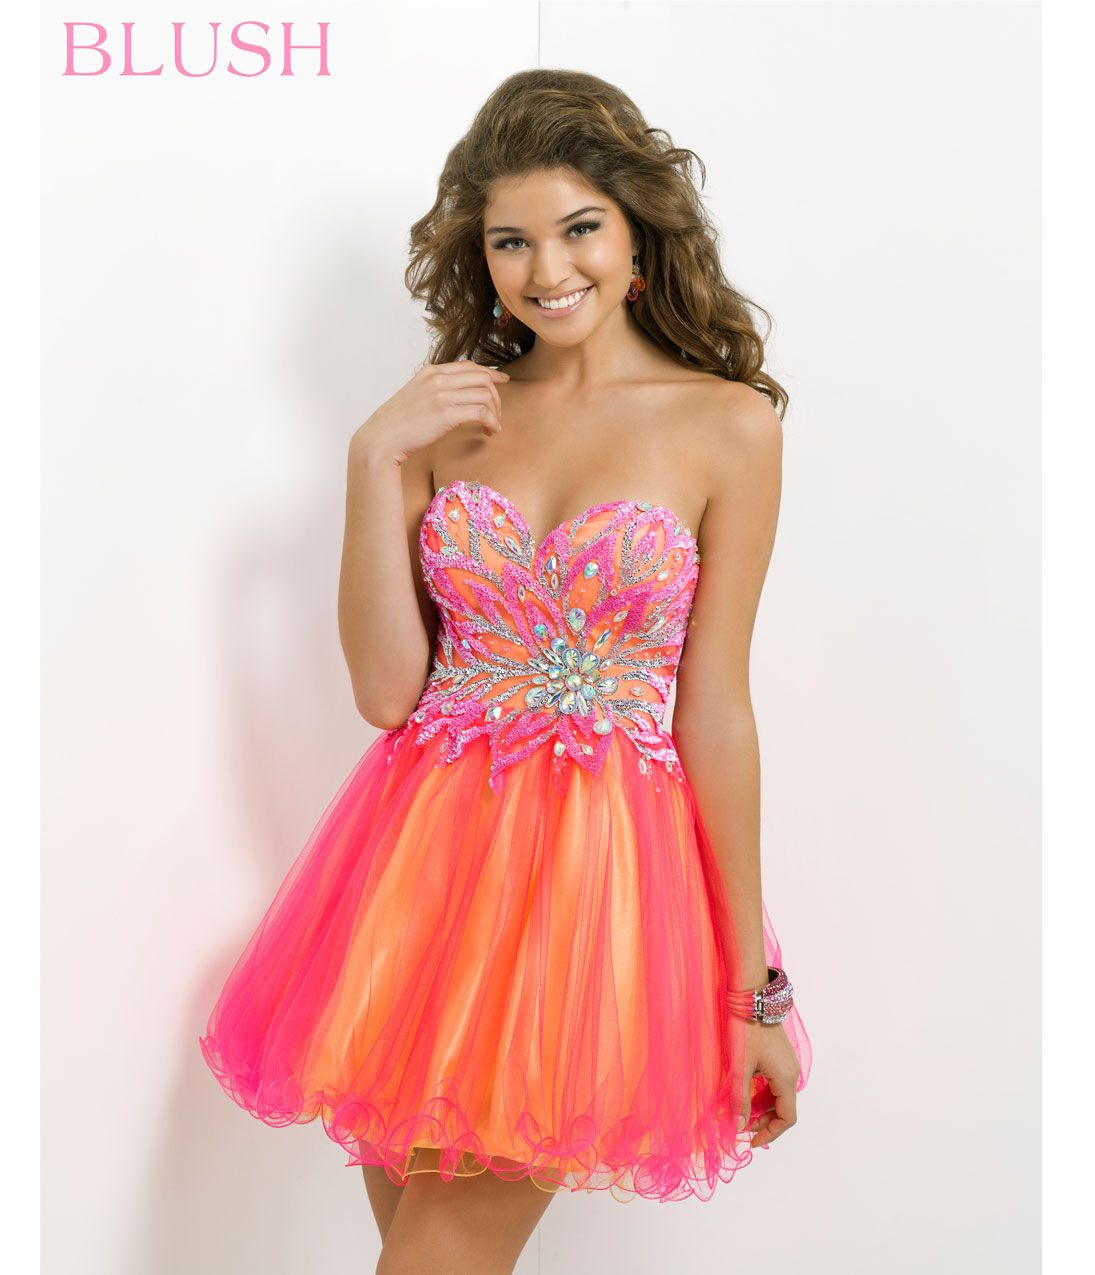 Prom dress dresses pinterest prom